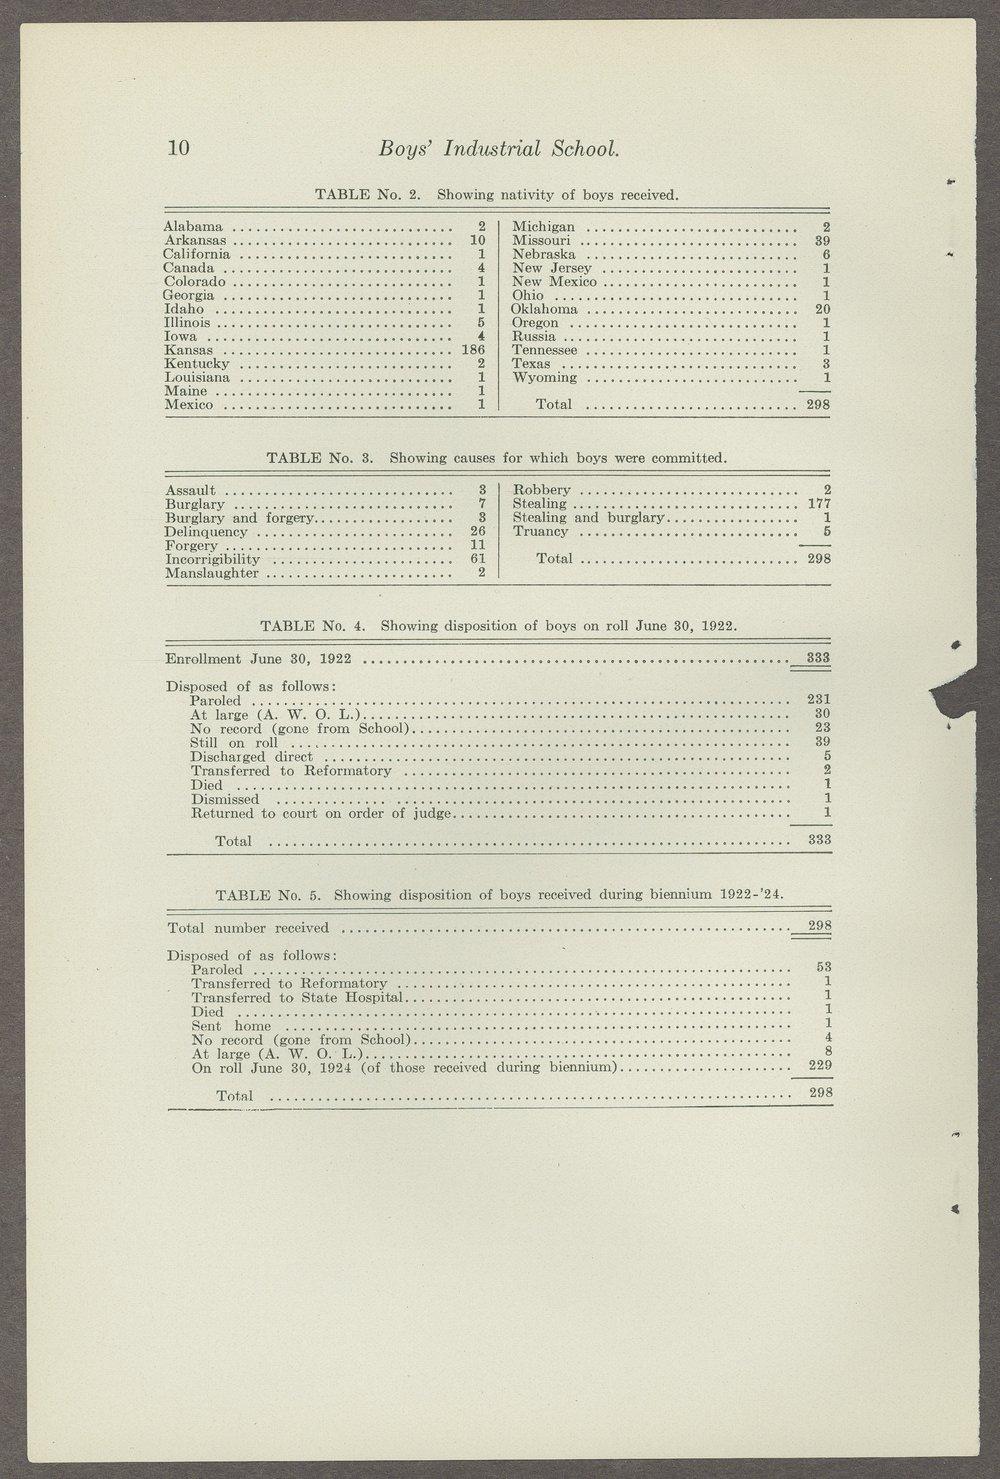 Biennial report of the Boys Industrial School, 1924 - 10